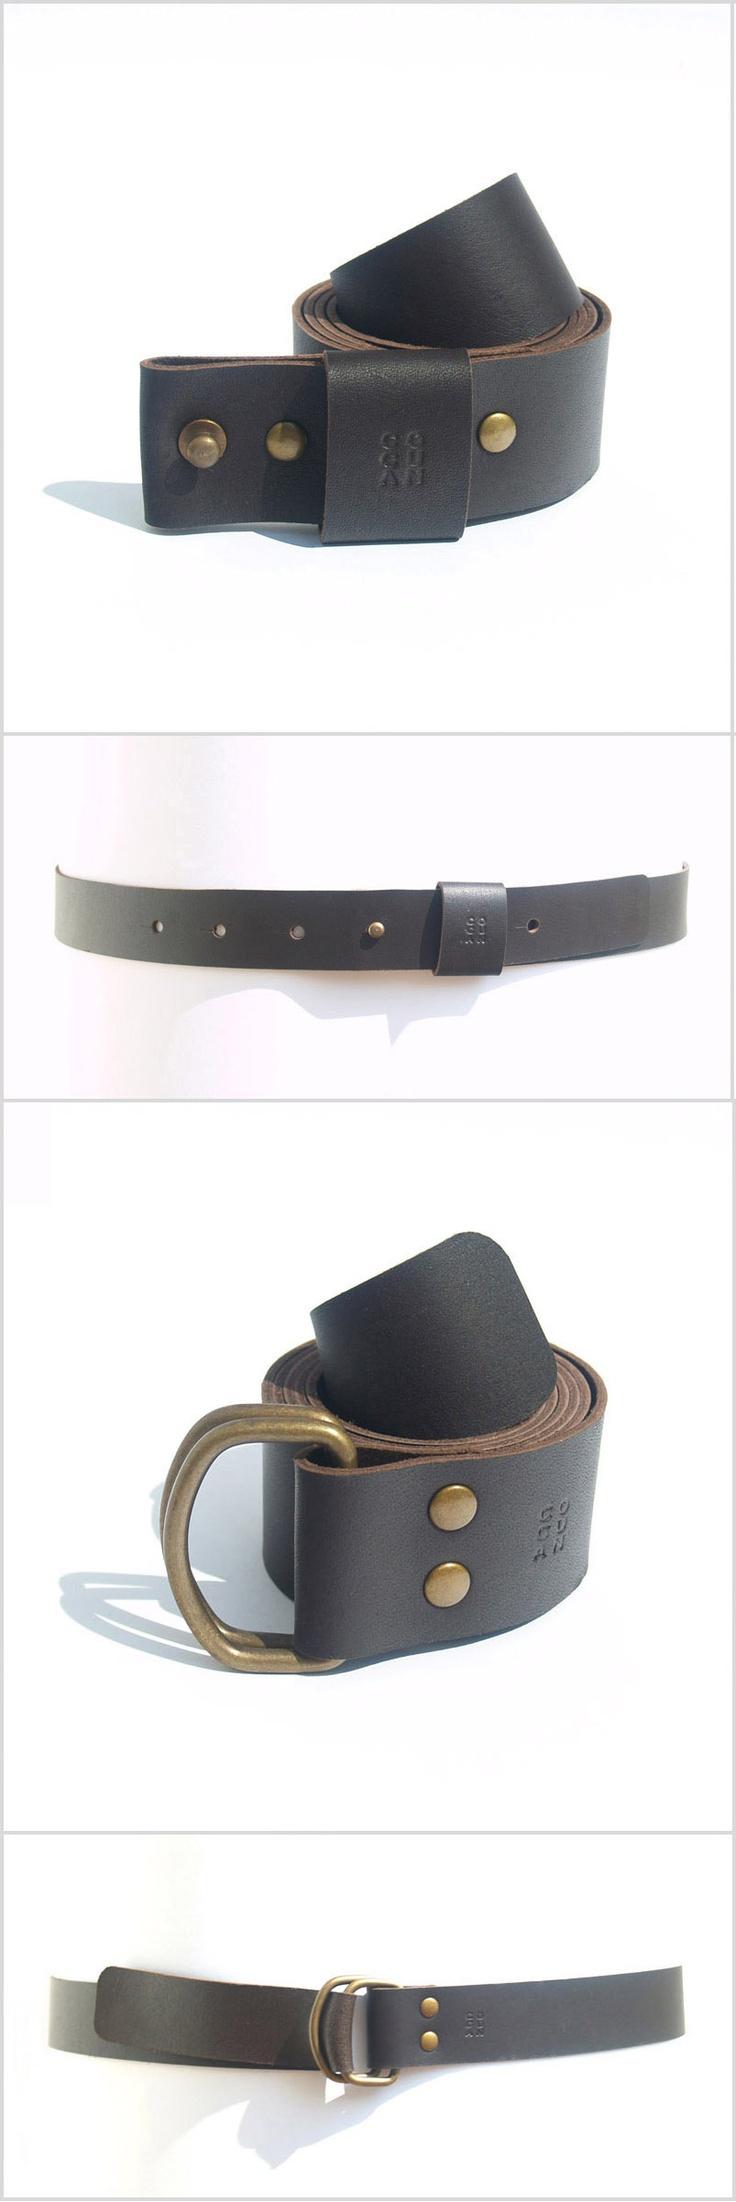 Cinturones cuero negro | Black leather belts - www.cocuan.com